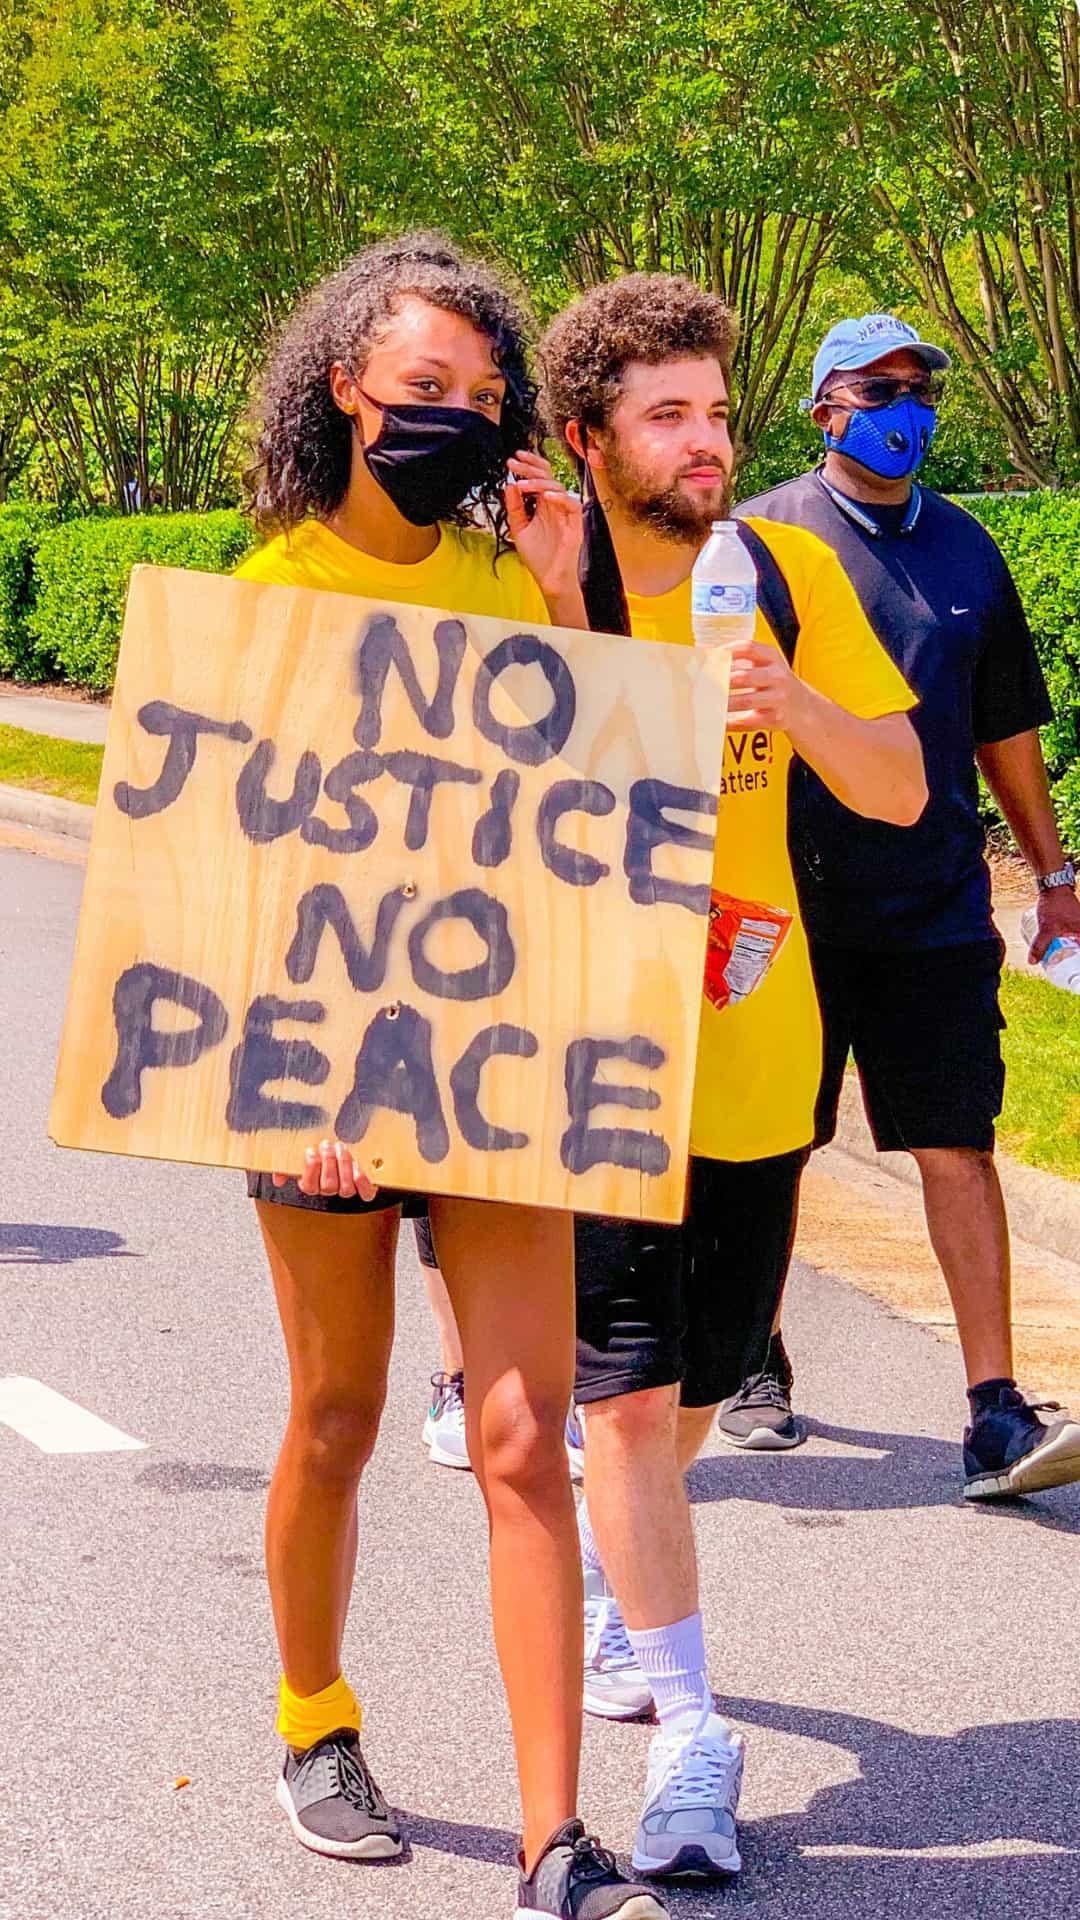 no justice no peace Black lives matter protest sign